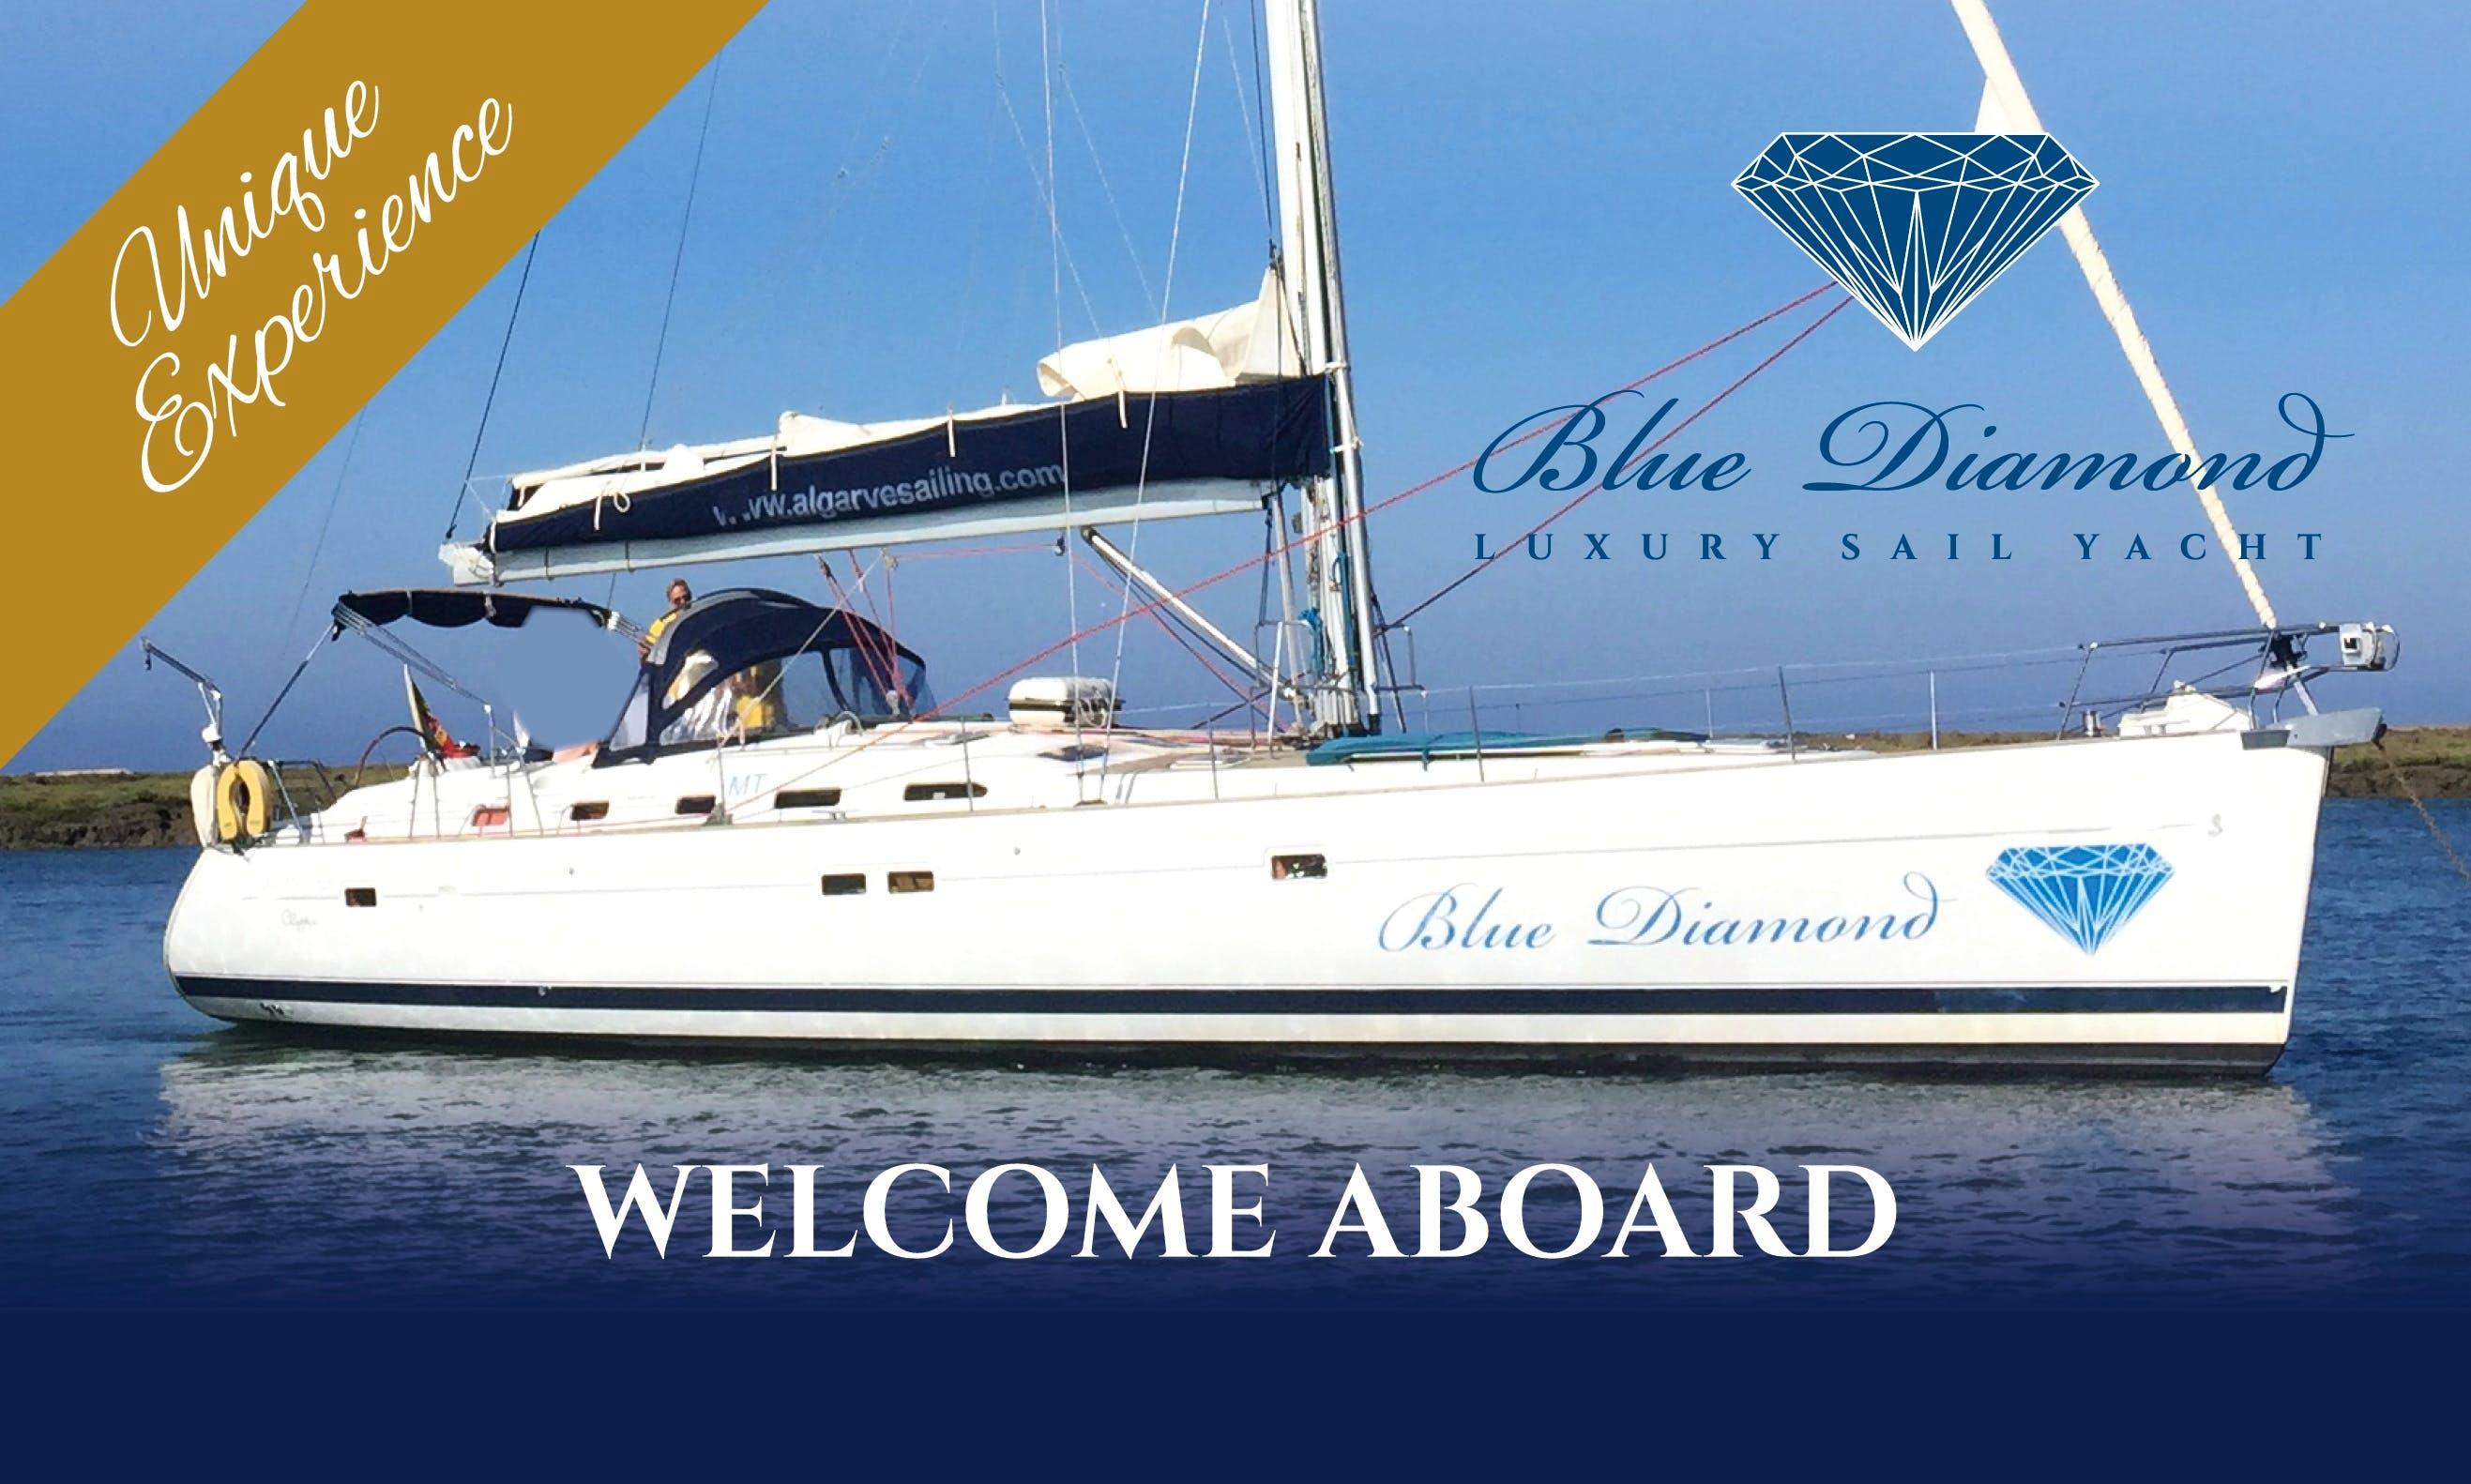 Blue Diamond, Beneteau 523 Oceanis Sail Yacht Charter in Albufeira, Algarve, Portugal